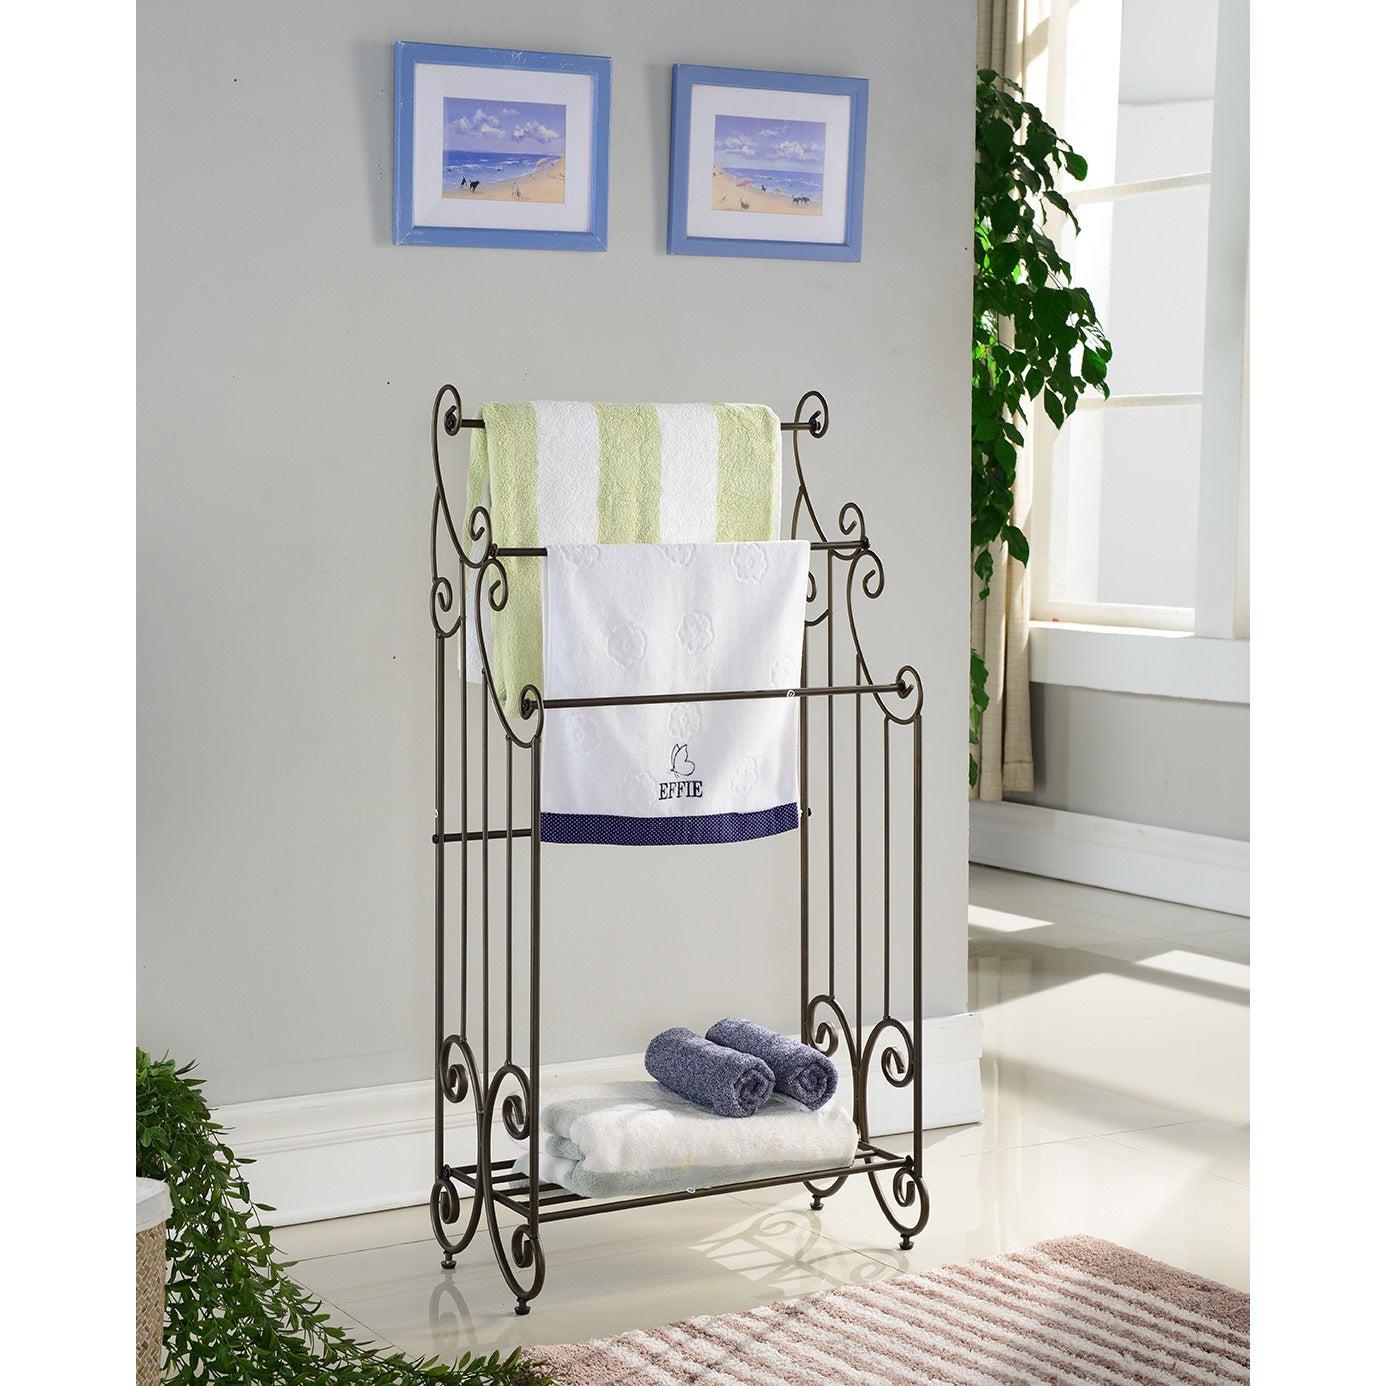 Shop K&B Towel Rack - Free Shipping Today - Overstock.com - 11746530